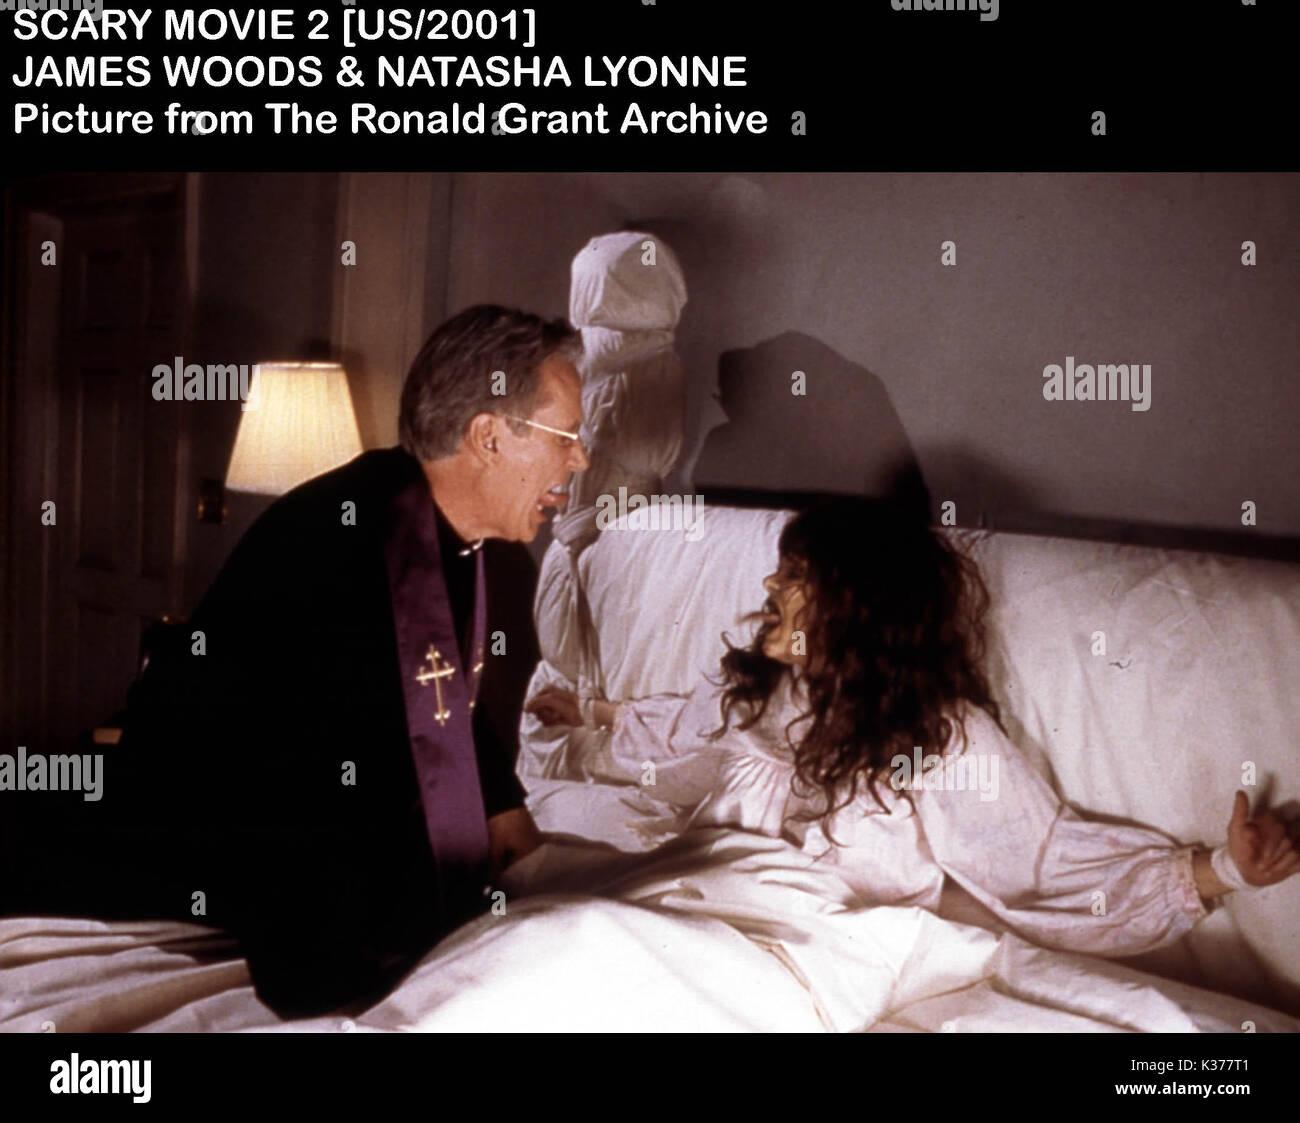 Natasha lyonne scary movie